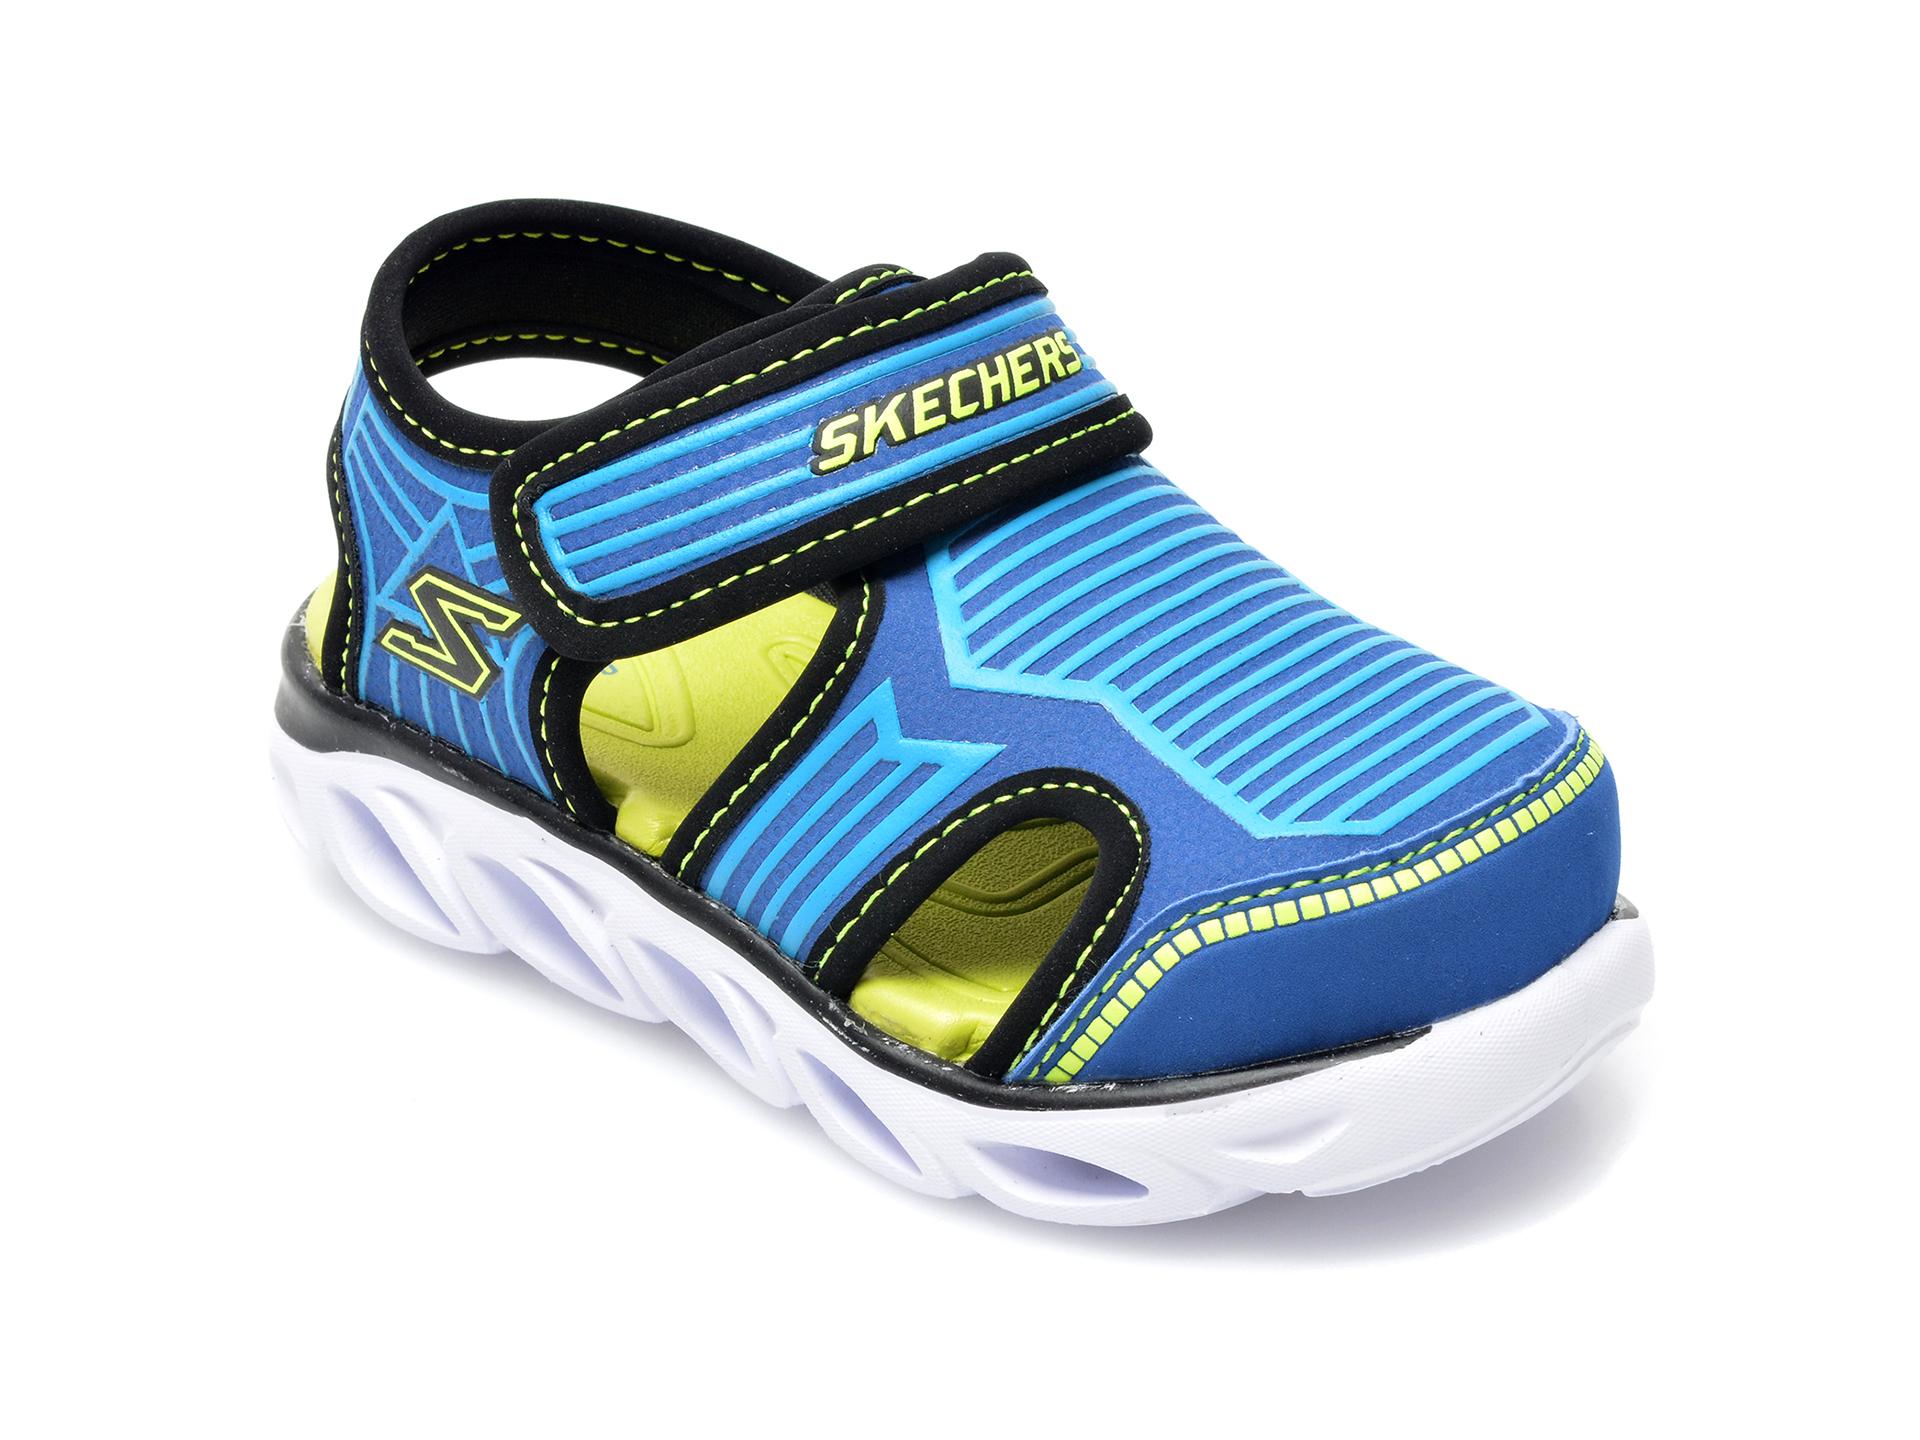 Sandale SKECHERS albastre, Hypno-Splash Zotex, din piele ecologica